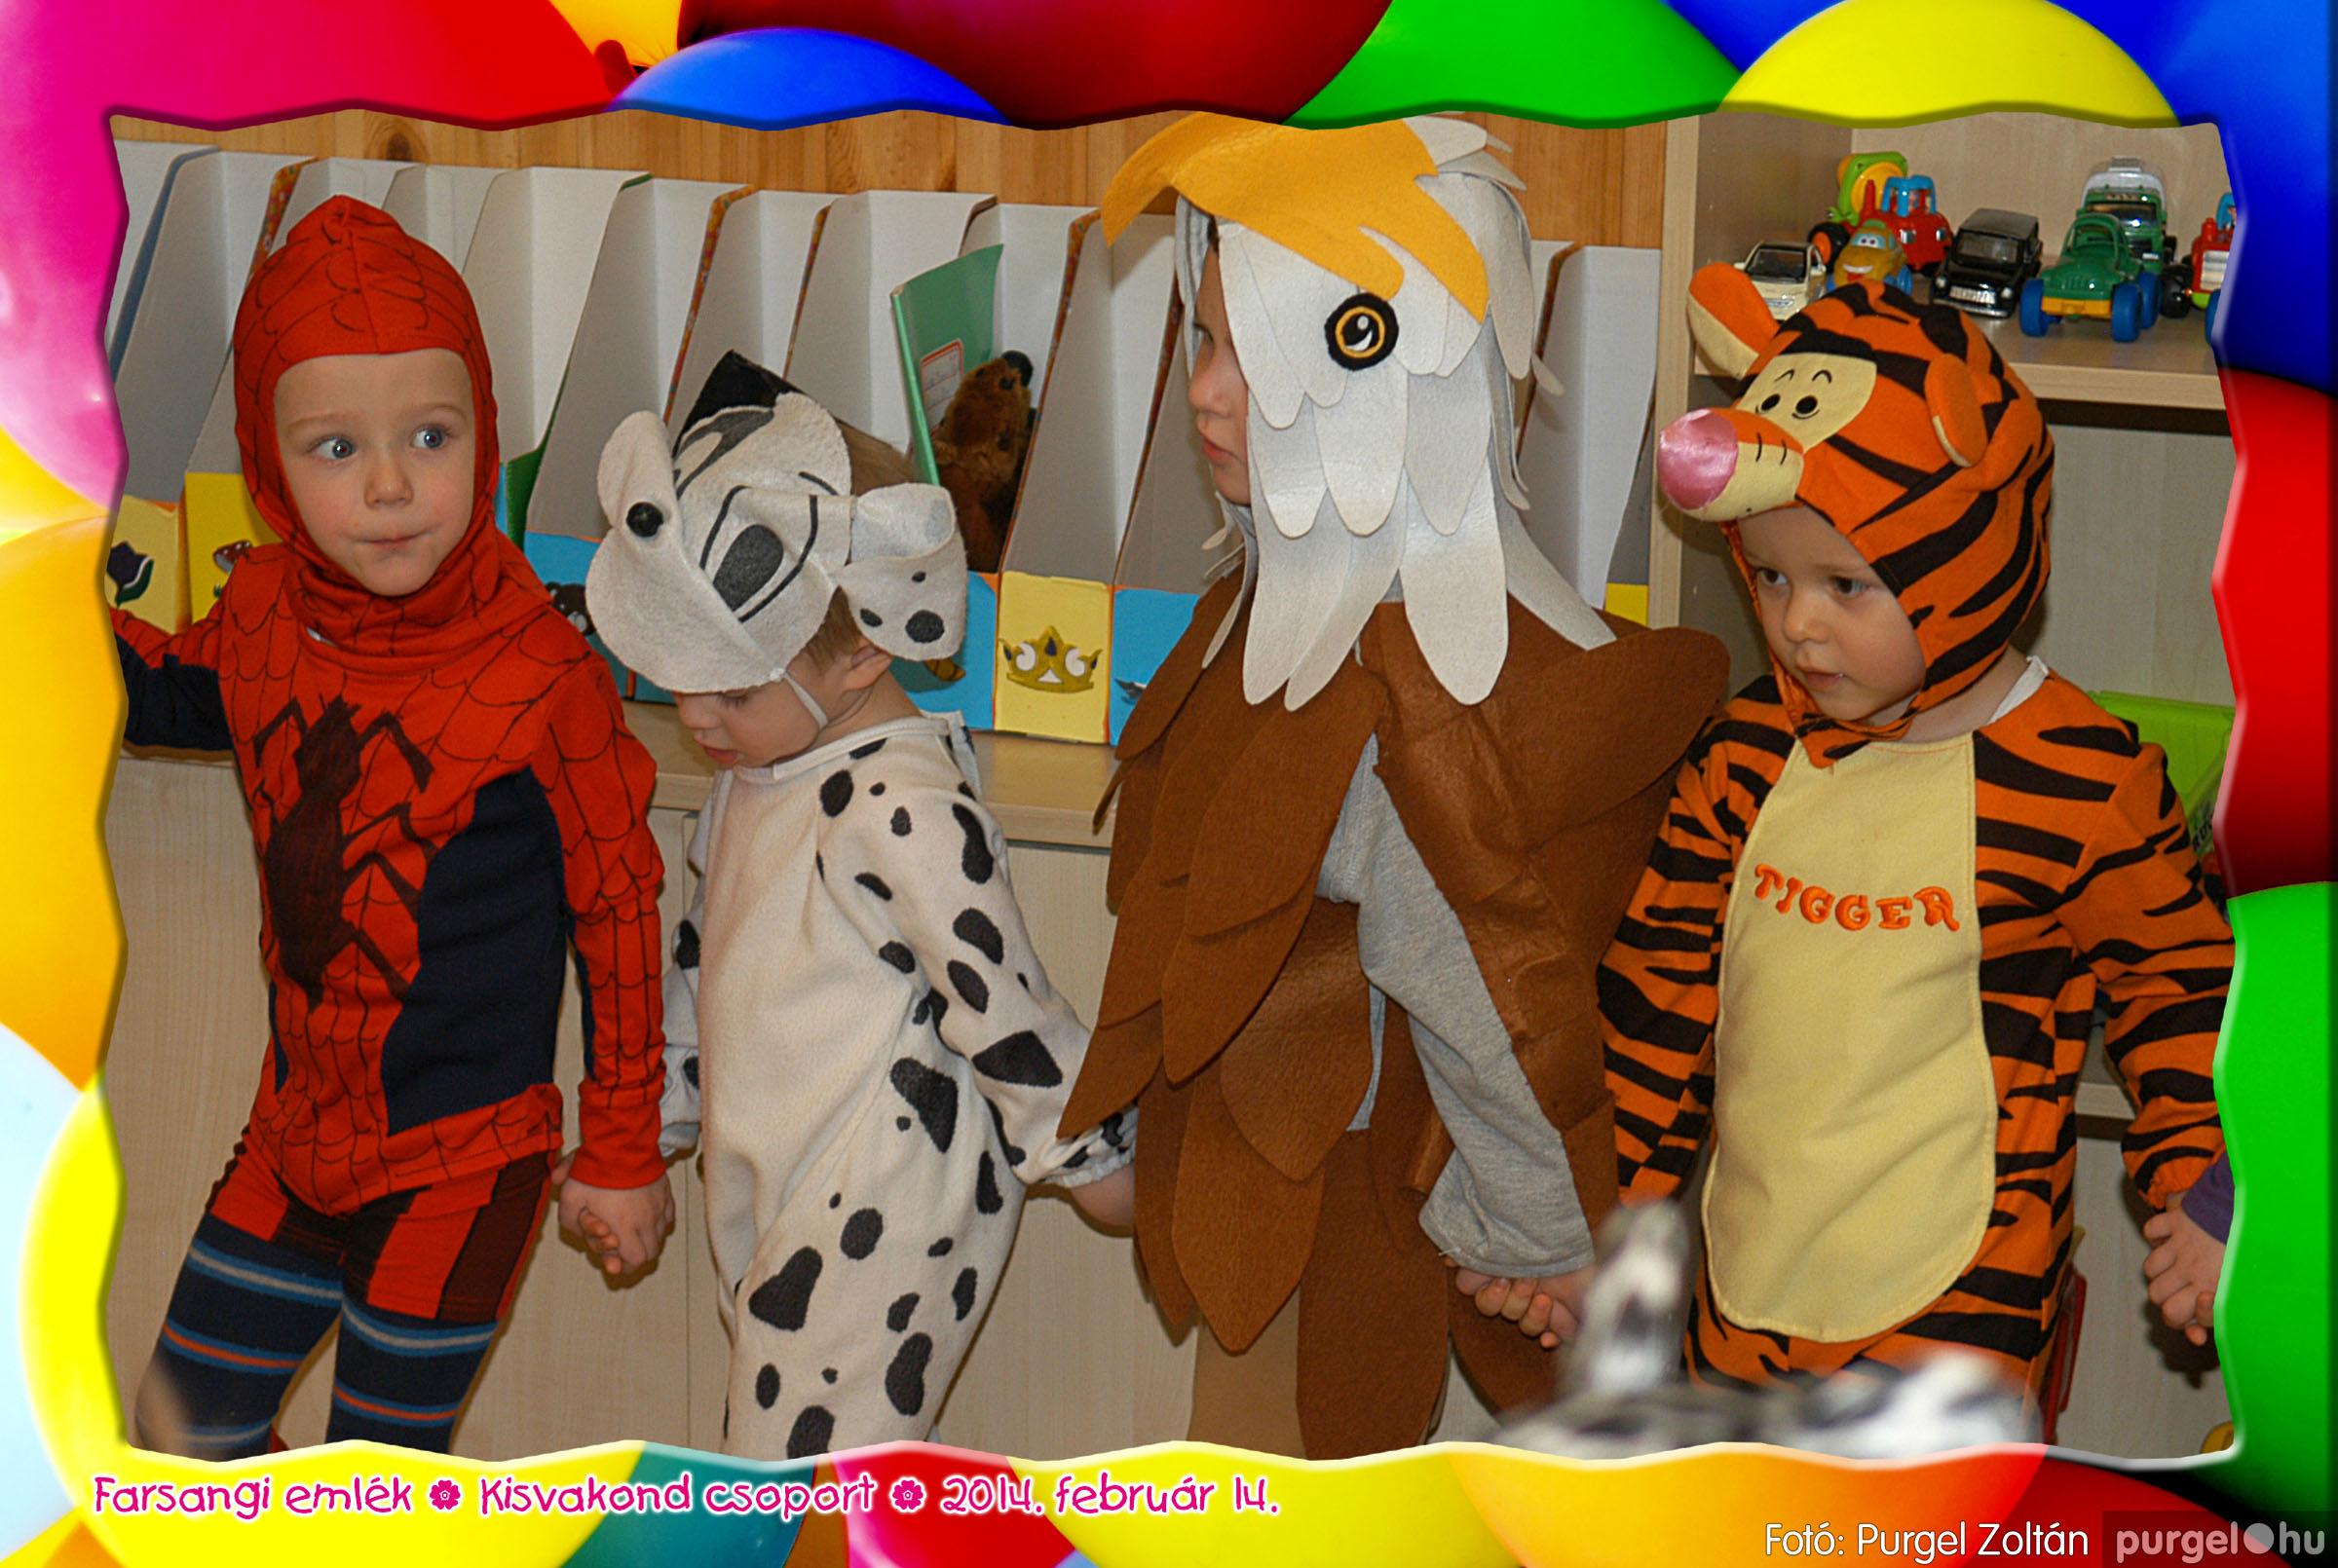 2014.02.14. 208 Kurca-parti Óvoda farsang 2014. - Kisvakond csoport - Fotó:PURGEL ZOLTÁN© 428.jpg